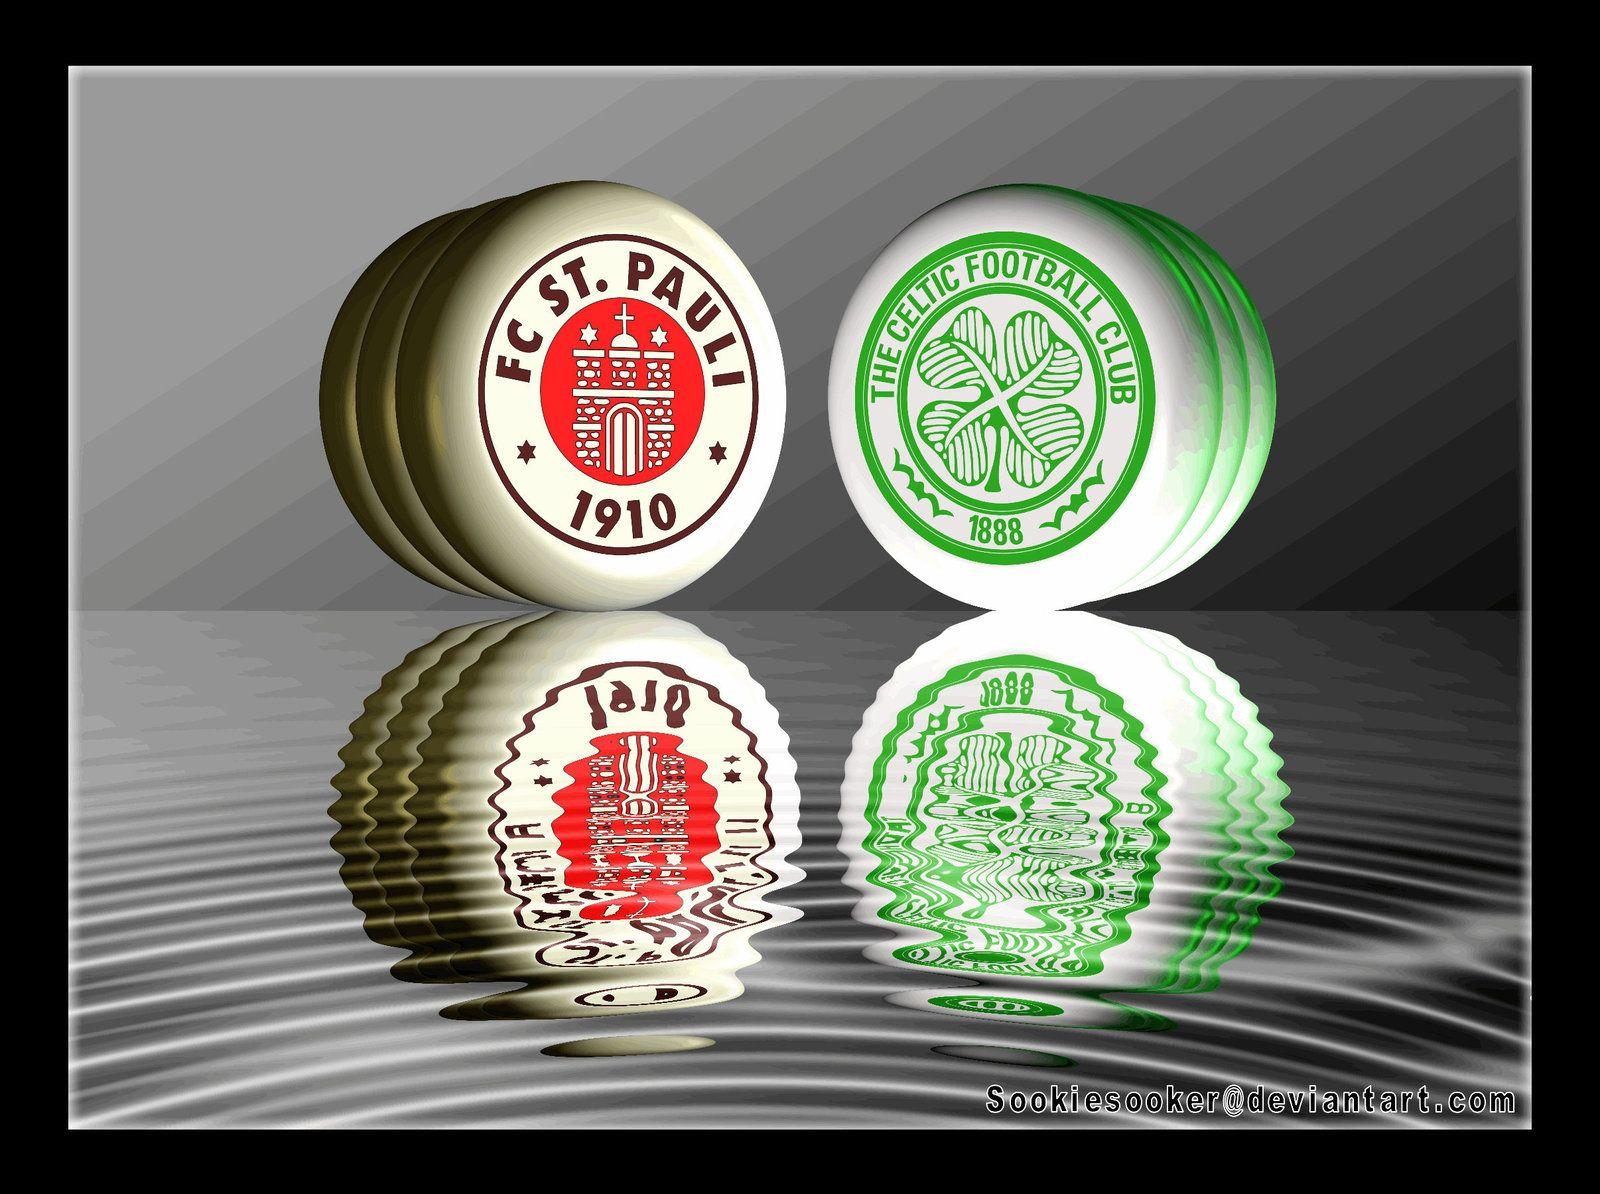 Celtic FC + FC ST Pauli Crests by sookiesooker.deviantart.com on @deviantART